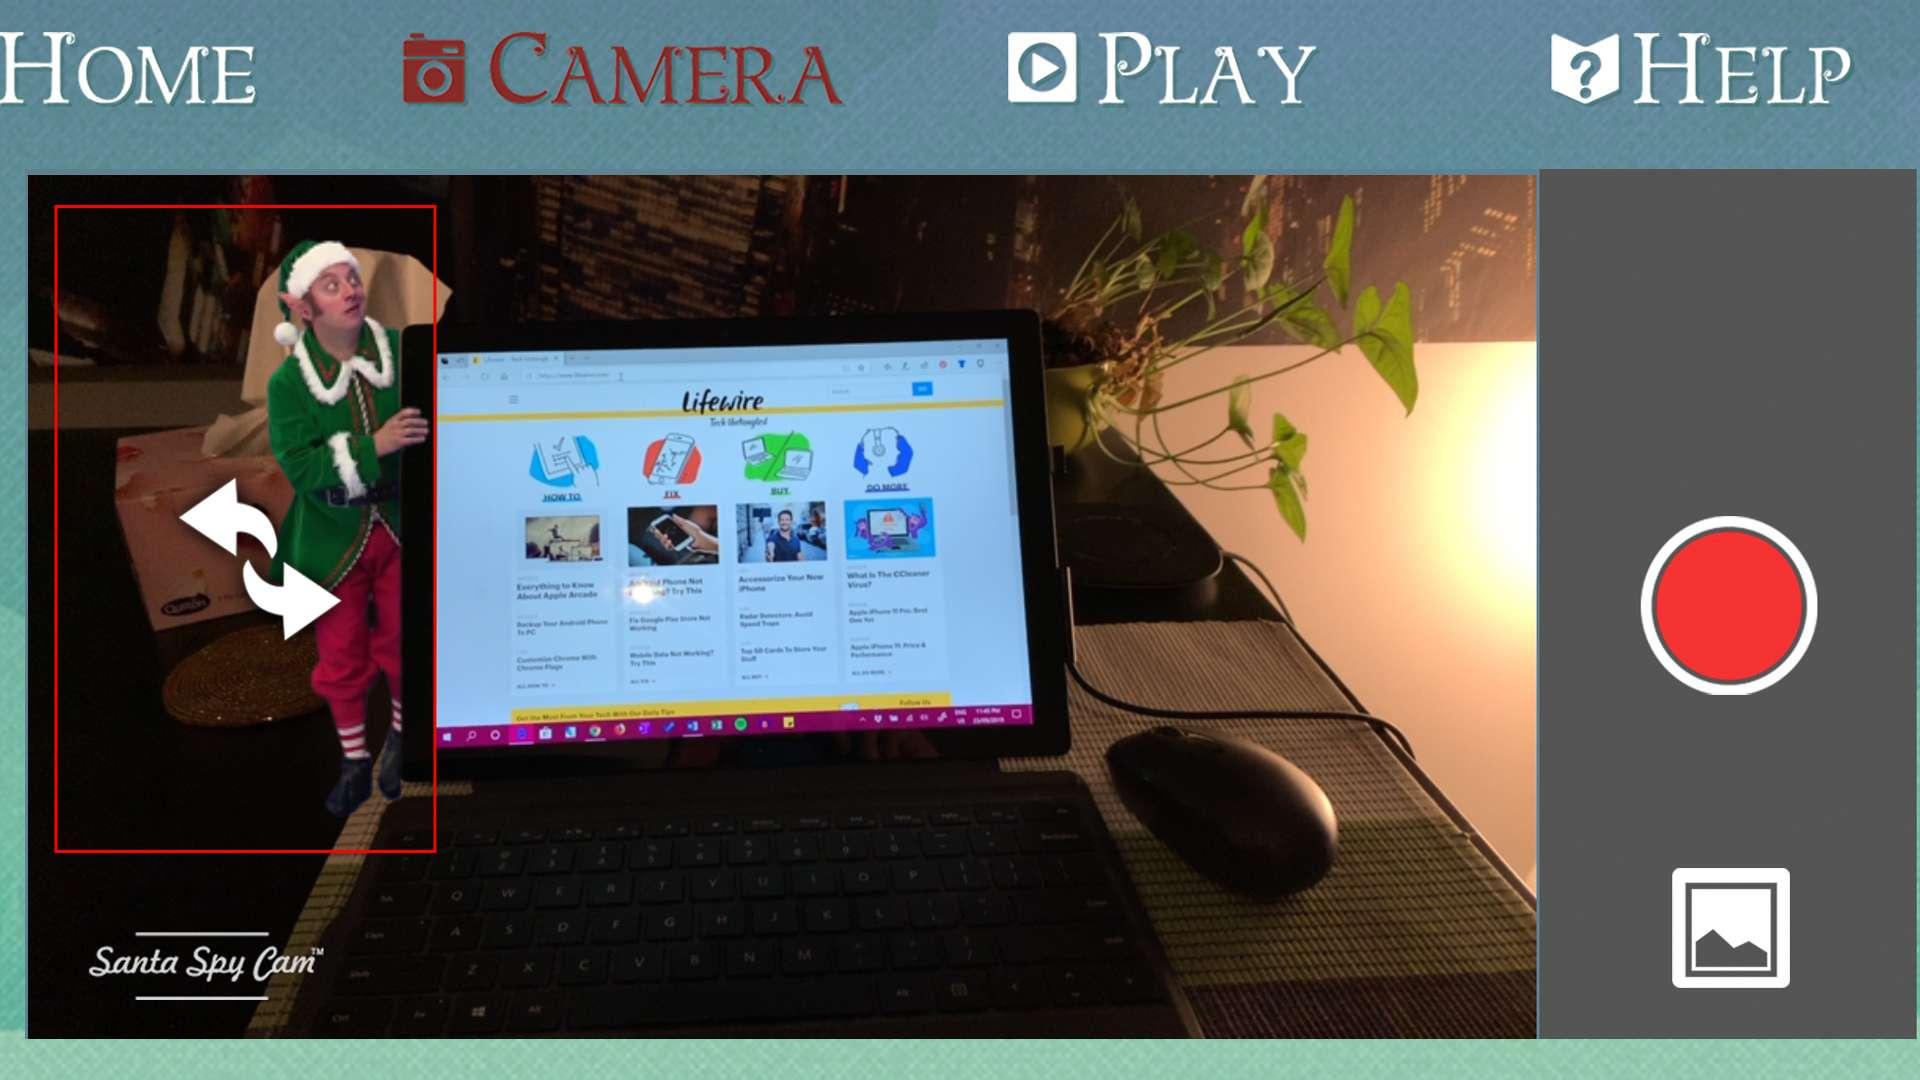 Santa Spy Cam 3 app on iPhone.